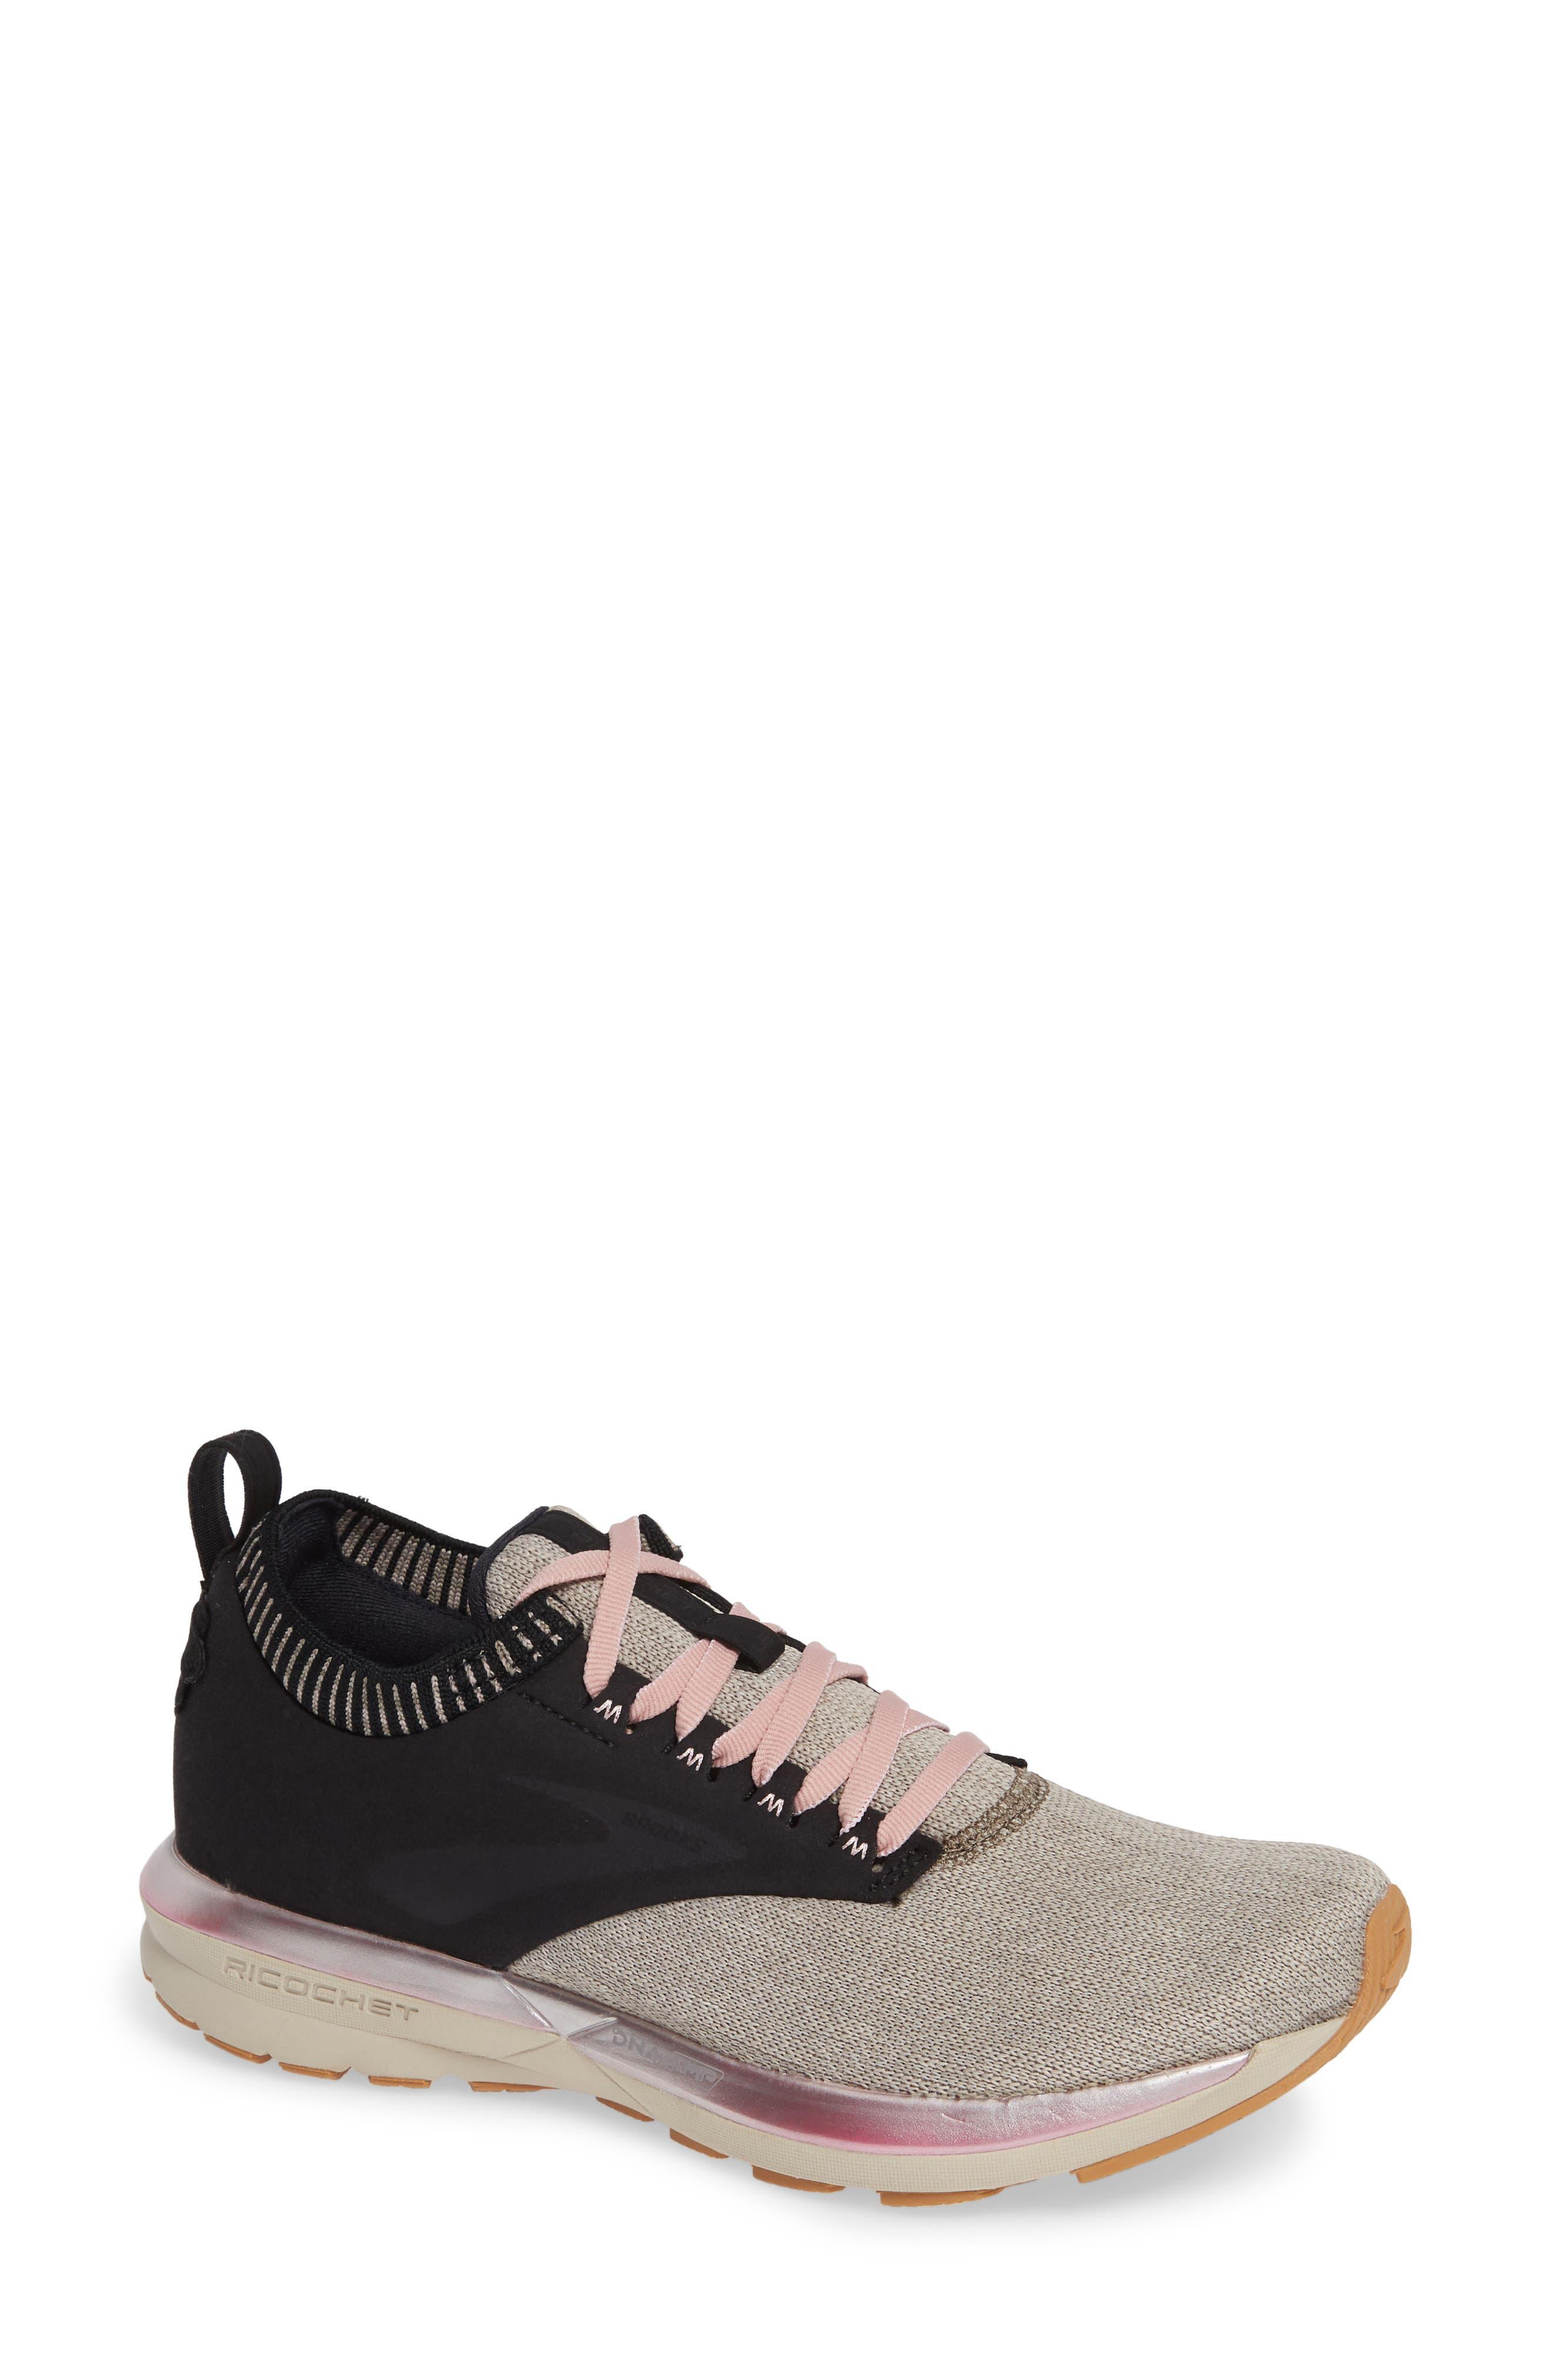 Brooks Ricochet Le Running Shoe, Black